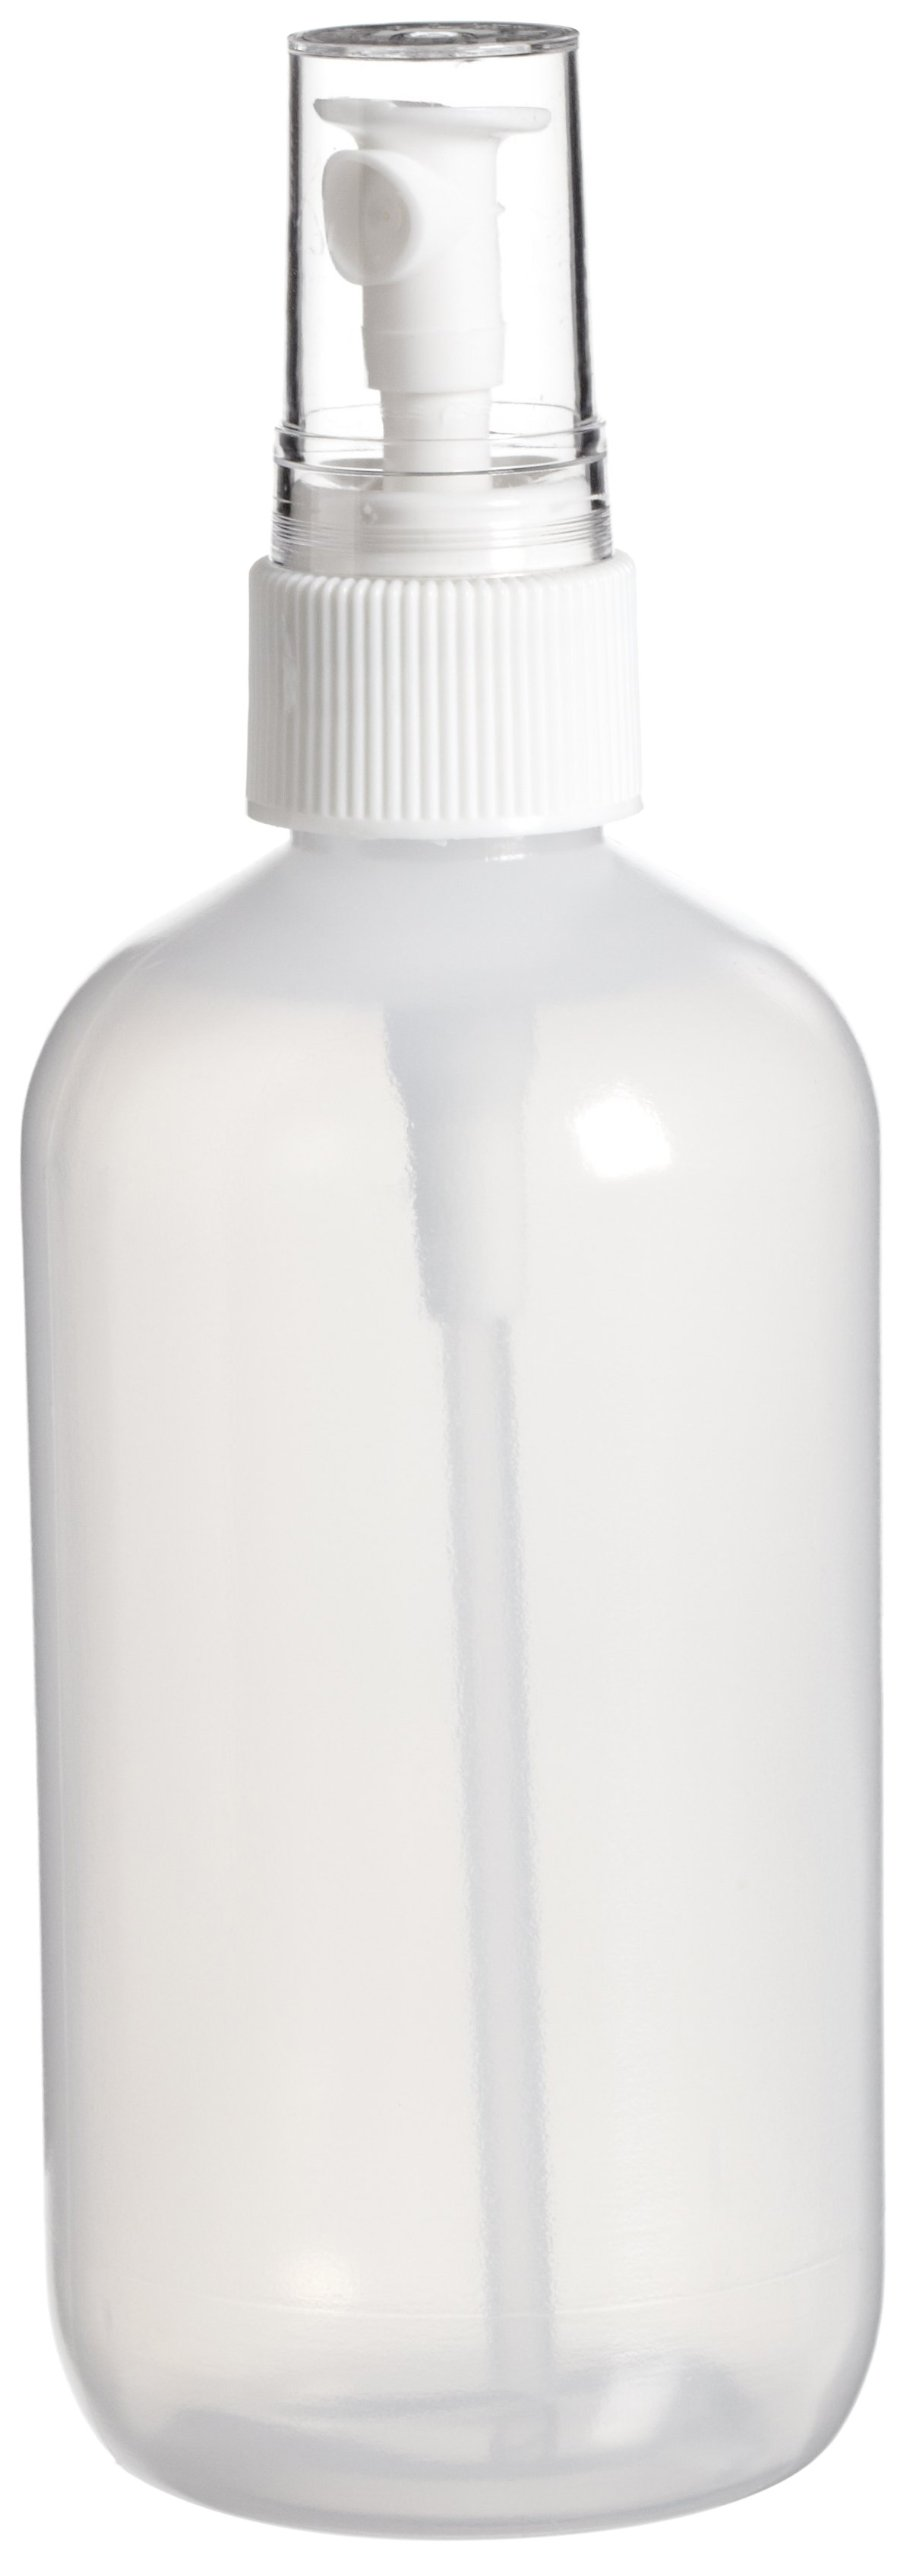 Bel-Art Spray Pump 250ml (8oz) Polyethylene Bottles (Pack of 12) (F11633-0000)